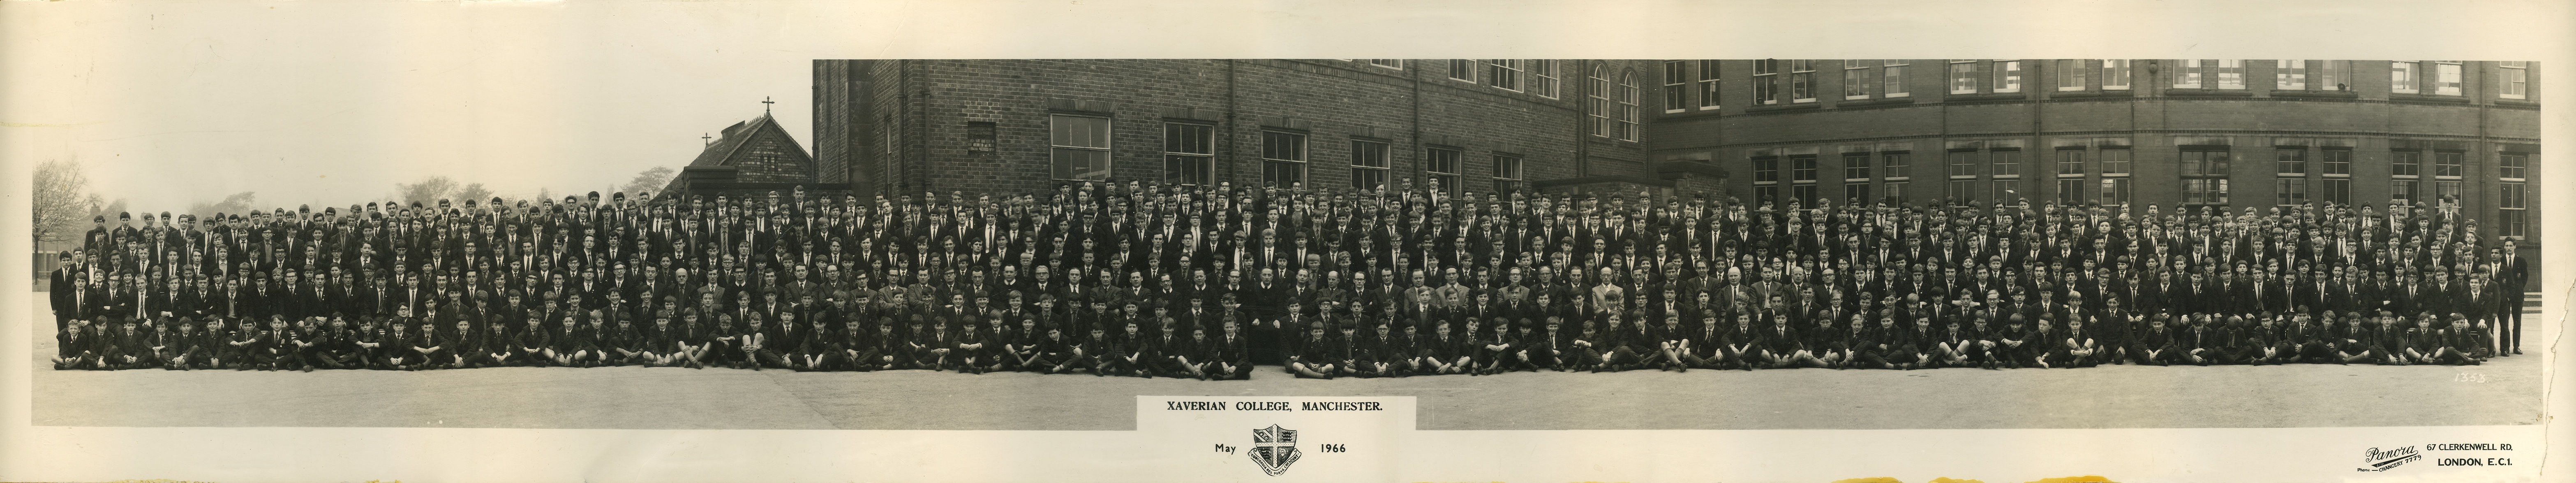 Xaverian College school photograph - May 1966